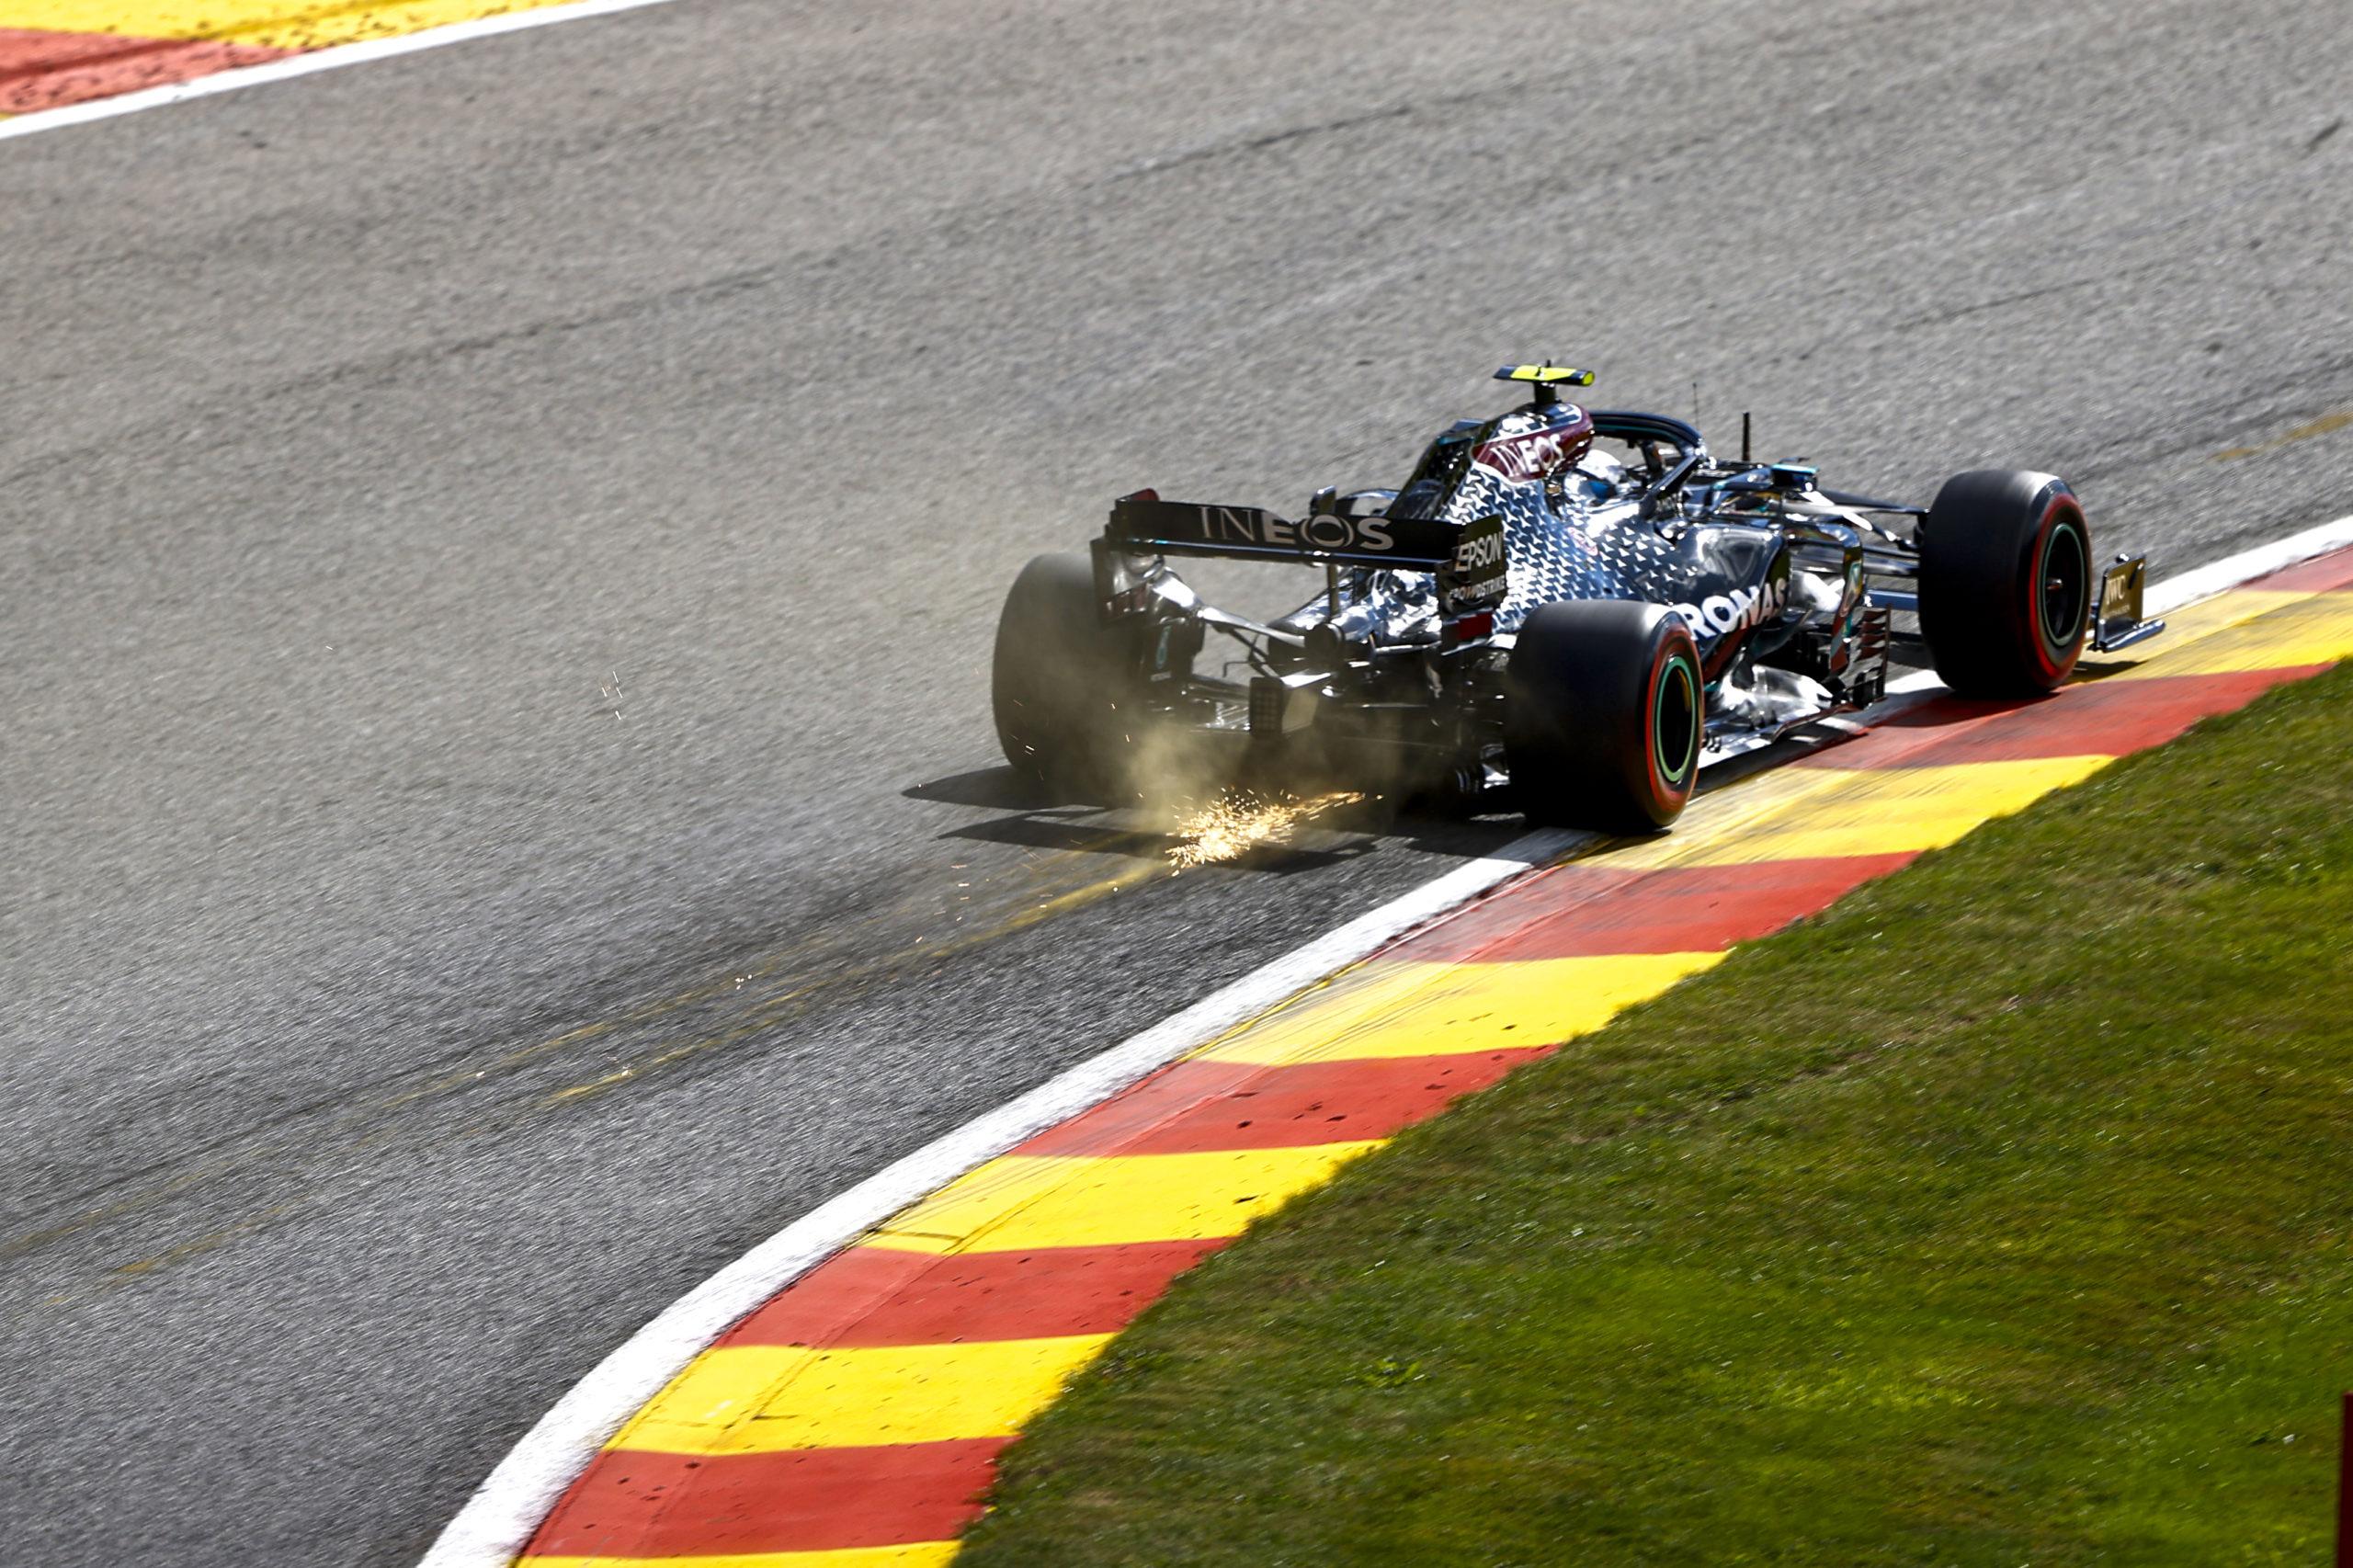 2020 Belgian Grand Prix, Saturday - LAT Images, Mercedes, Bottas